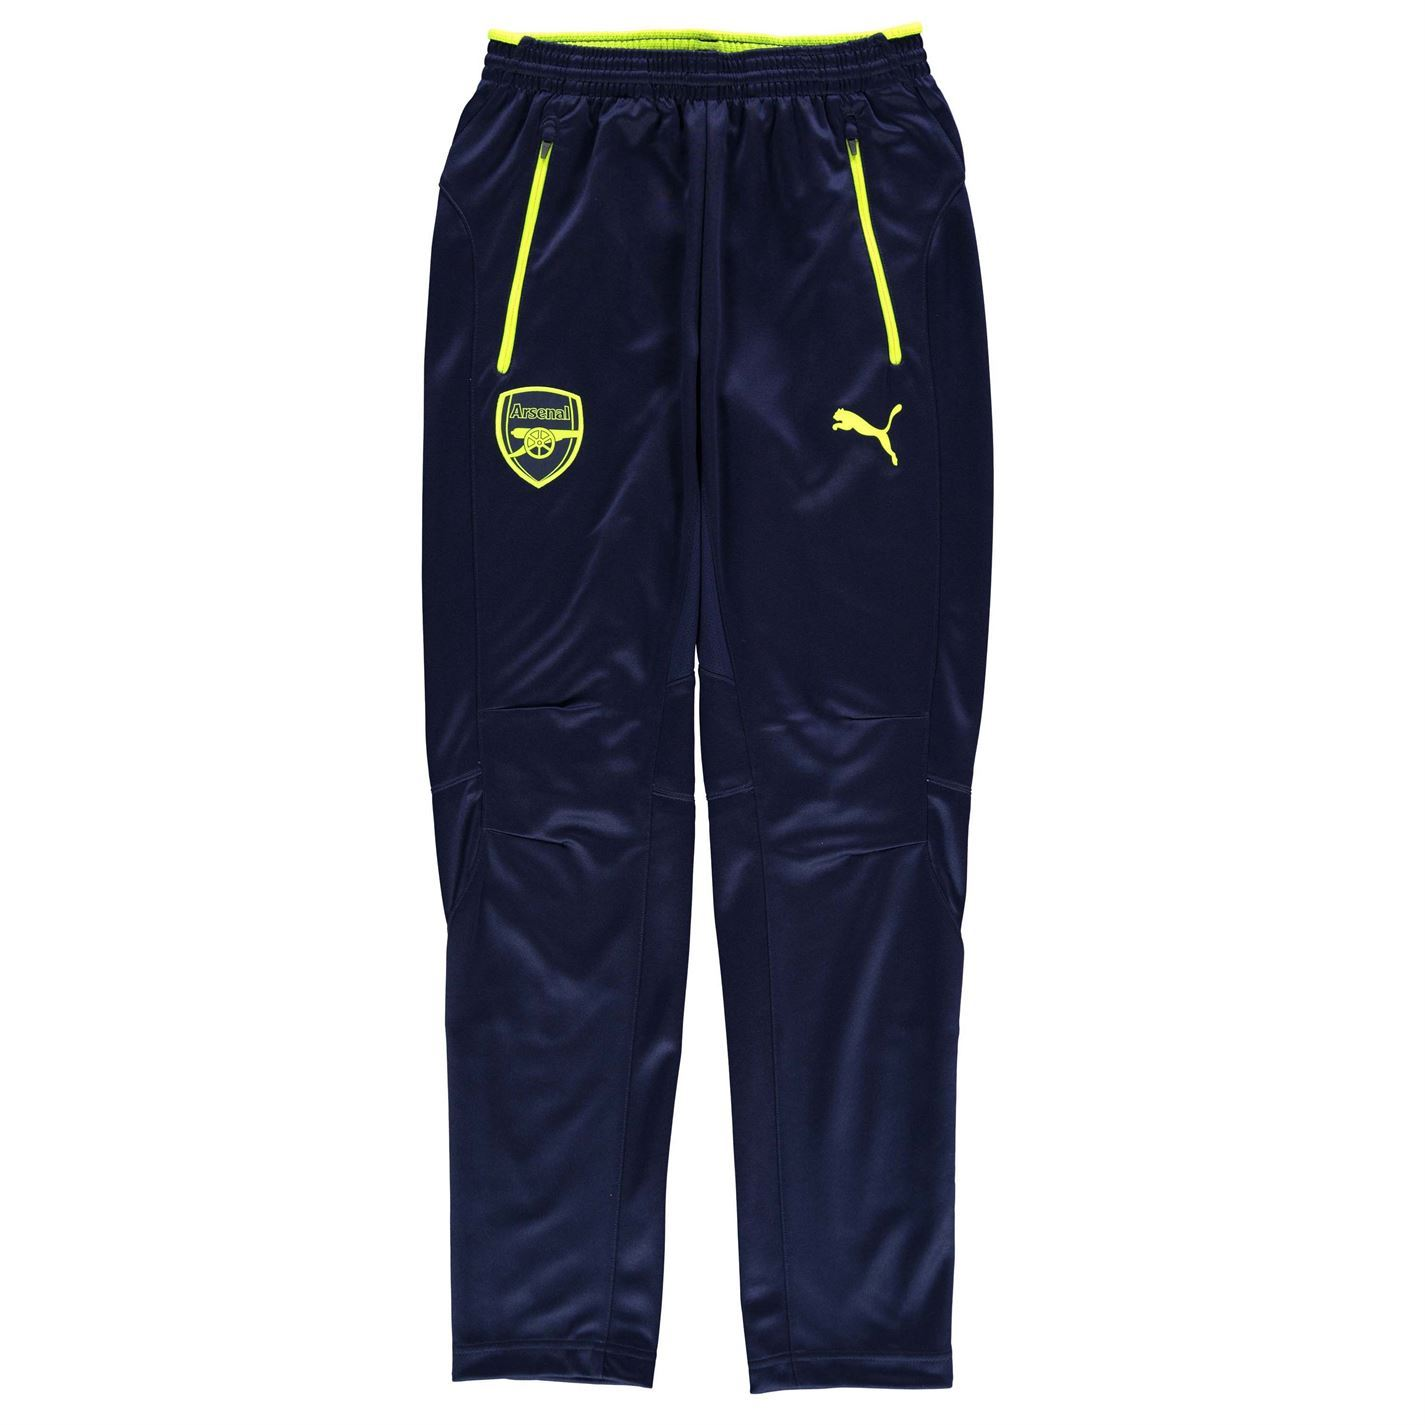 Calcio Maglie da calcio Arsenal Fc Puma Pantaloni tuta Pants